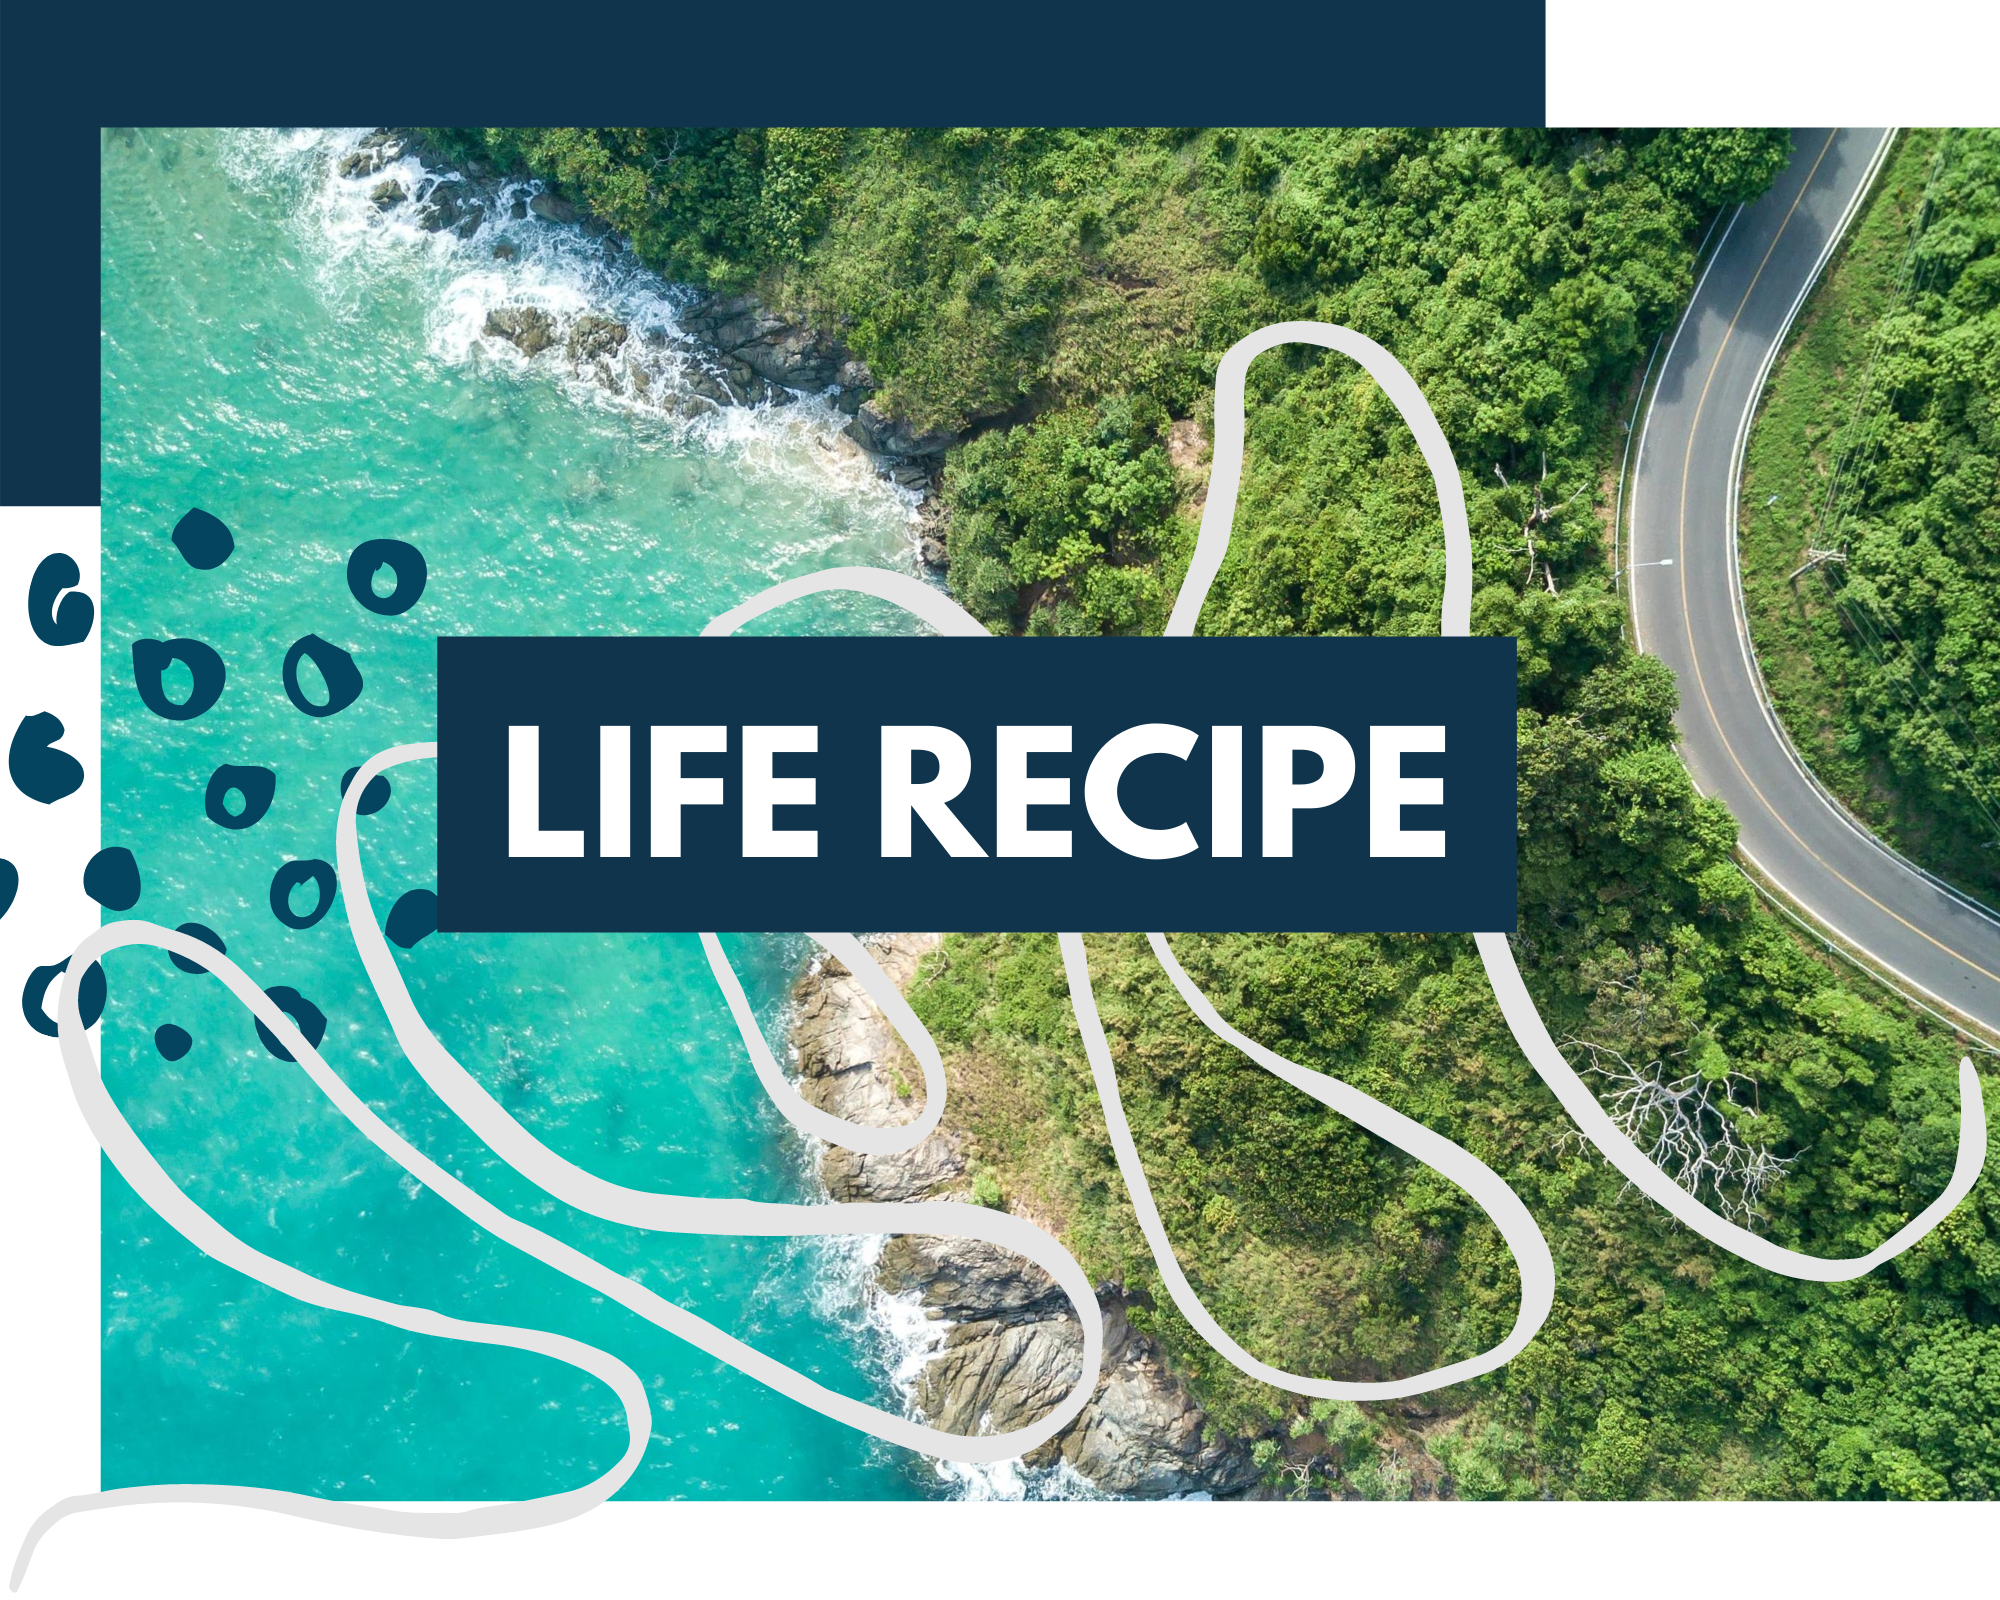 Life Recipe